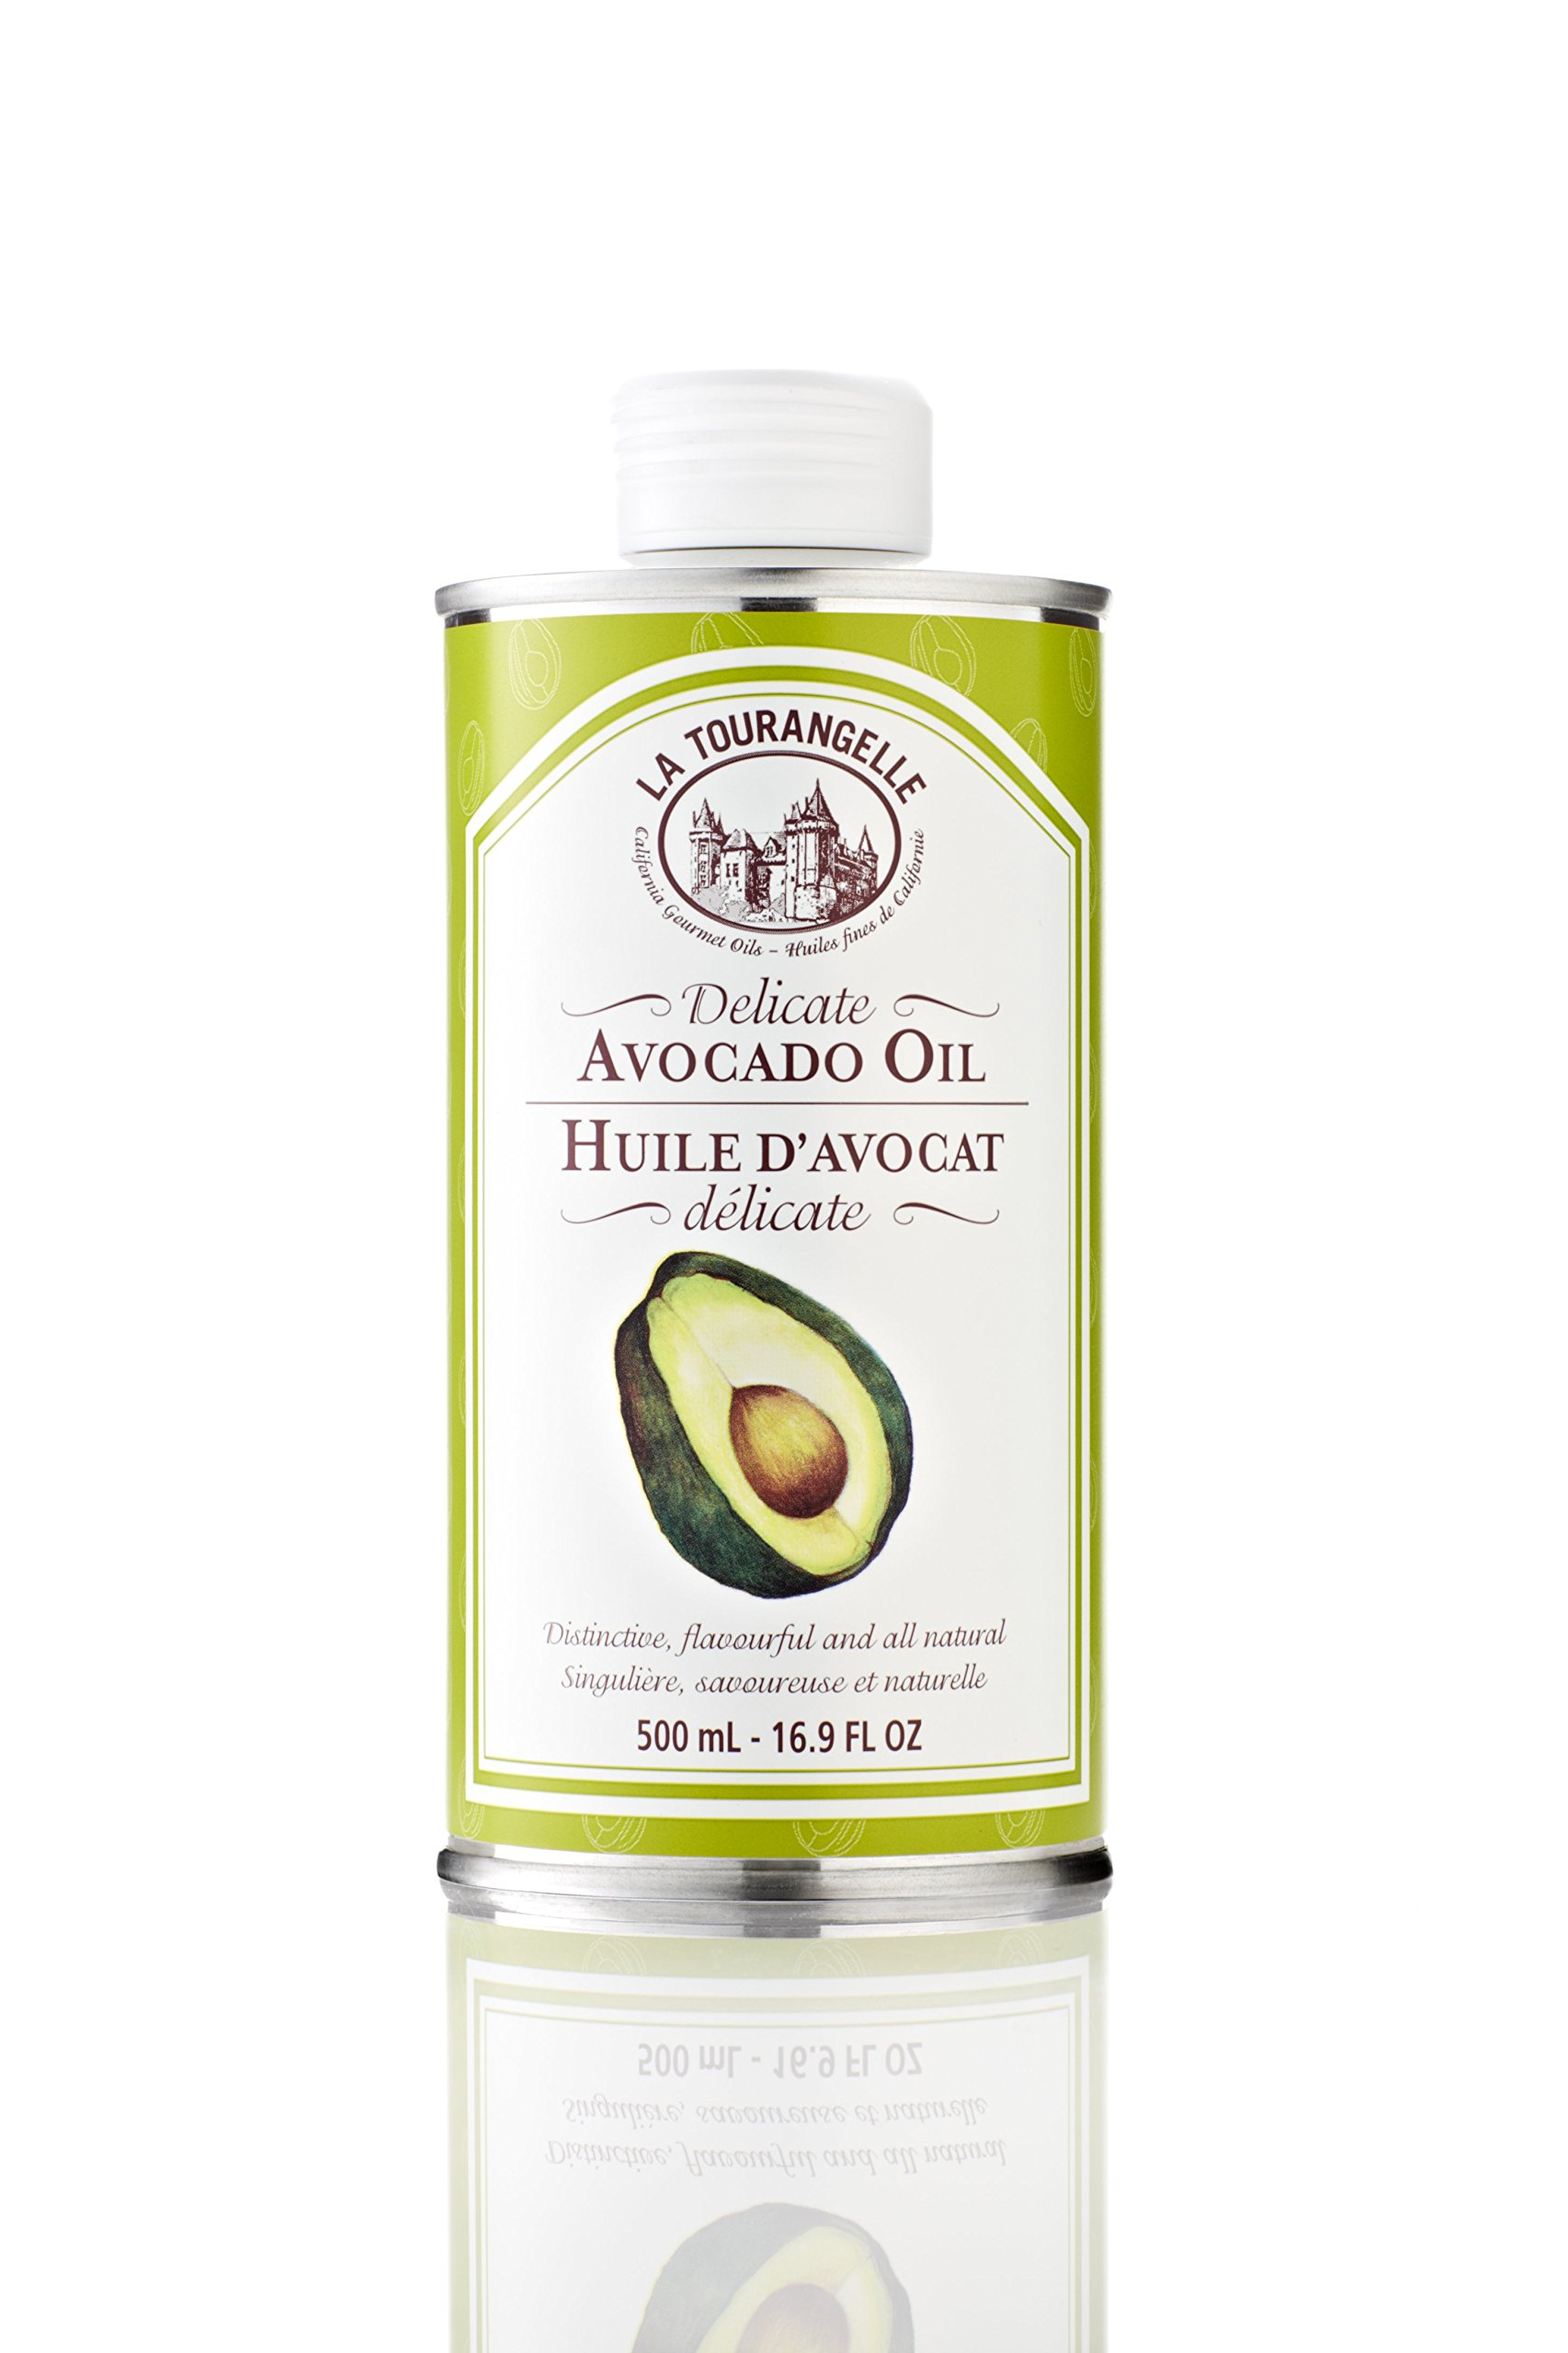 La Tourangelle Avocado Oil, 16.9-Ounce Tins (Pack of 2)